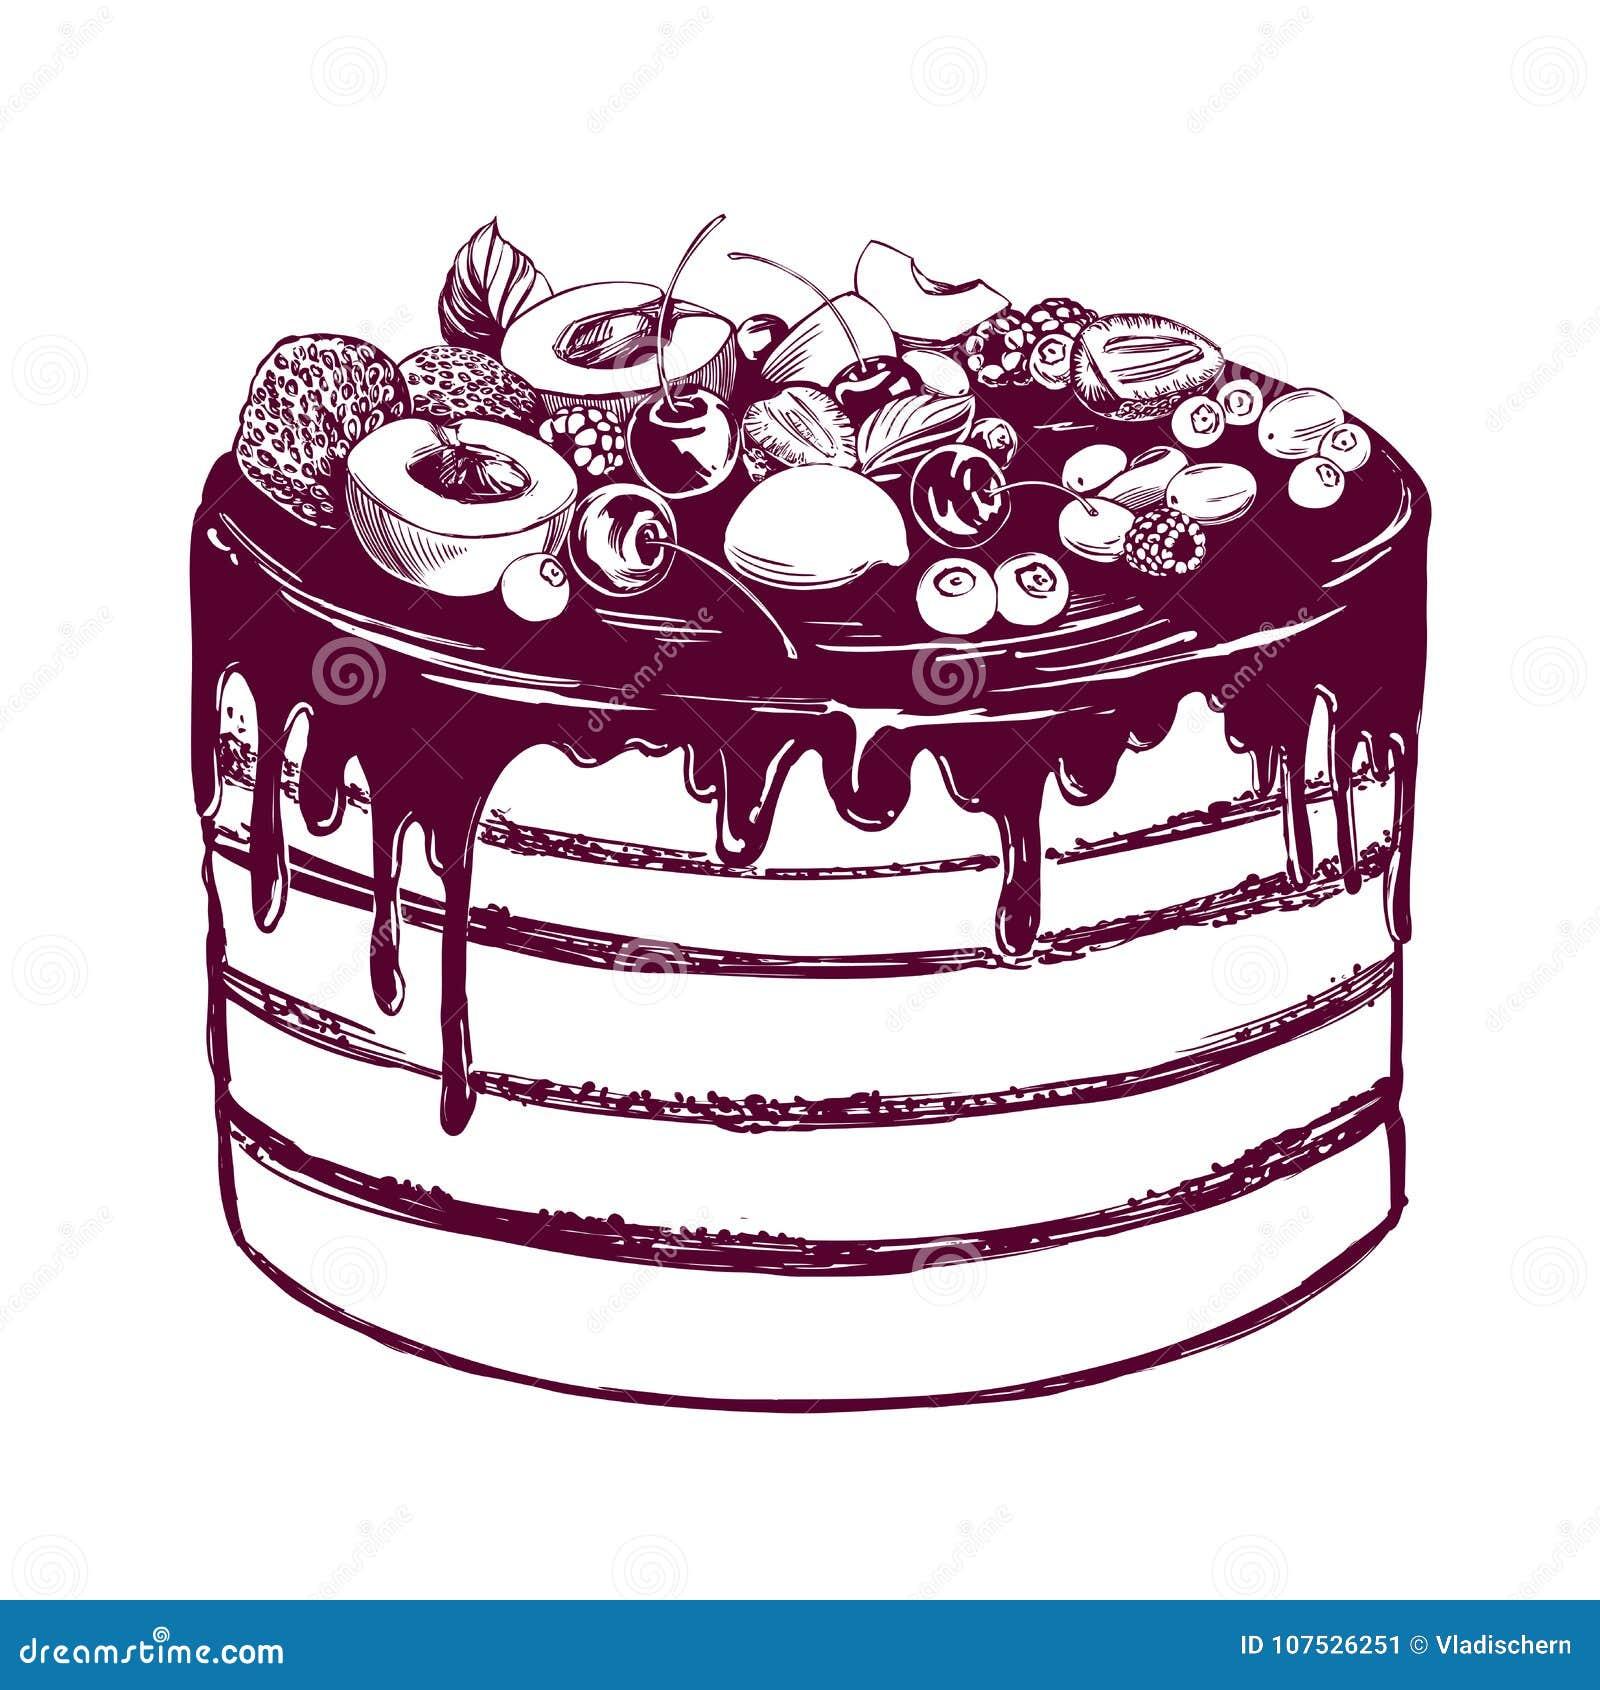 Fruit Cake Birthday Dessert Symbol Of The Holiday Hand Drawn